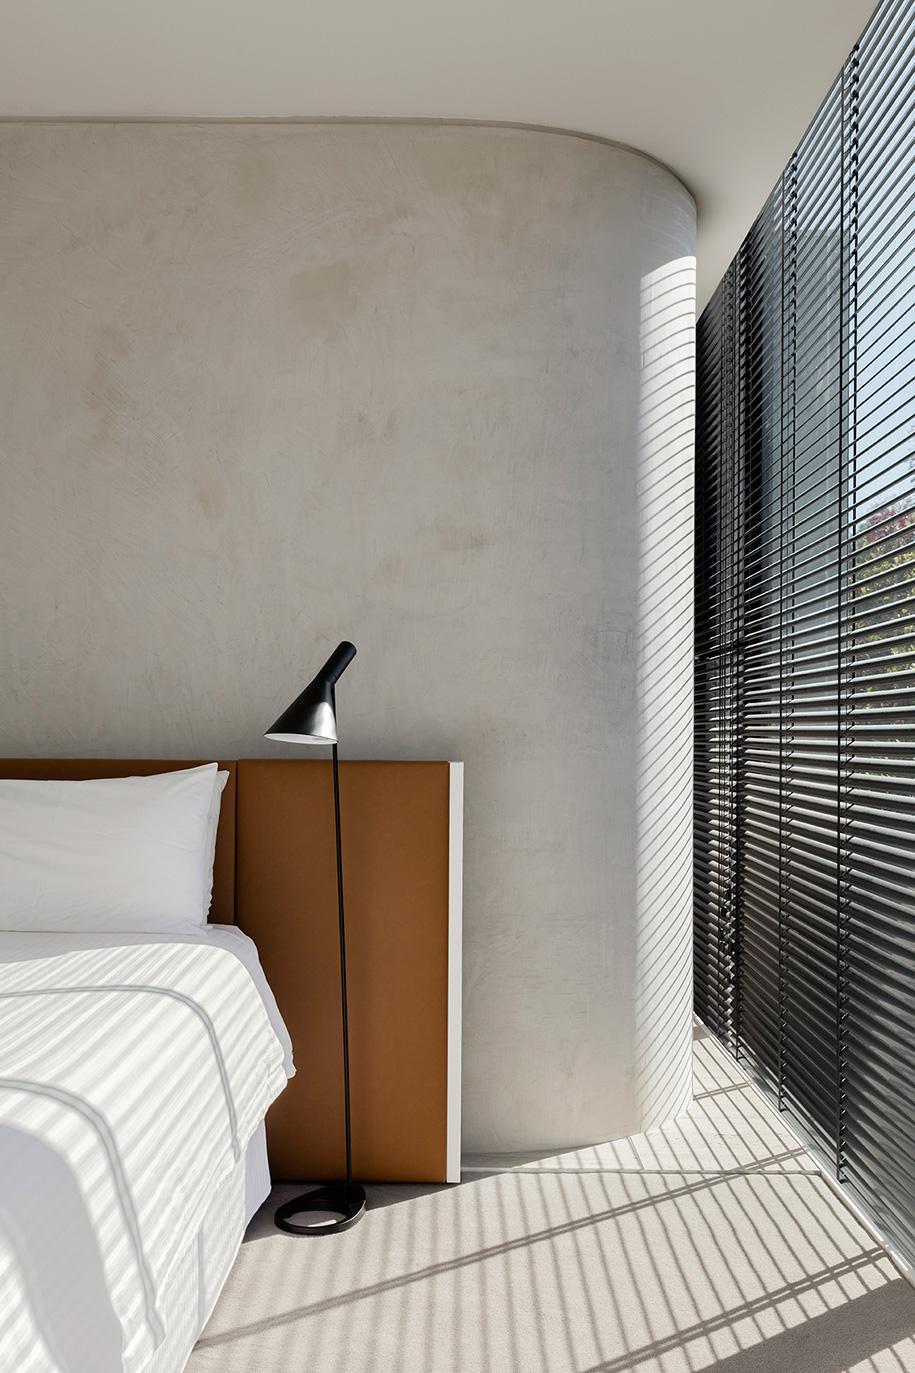 LSD House - Davidov Partners Architect | Habitus Living